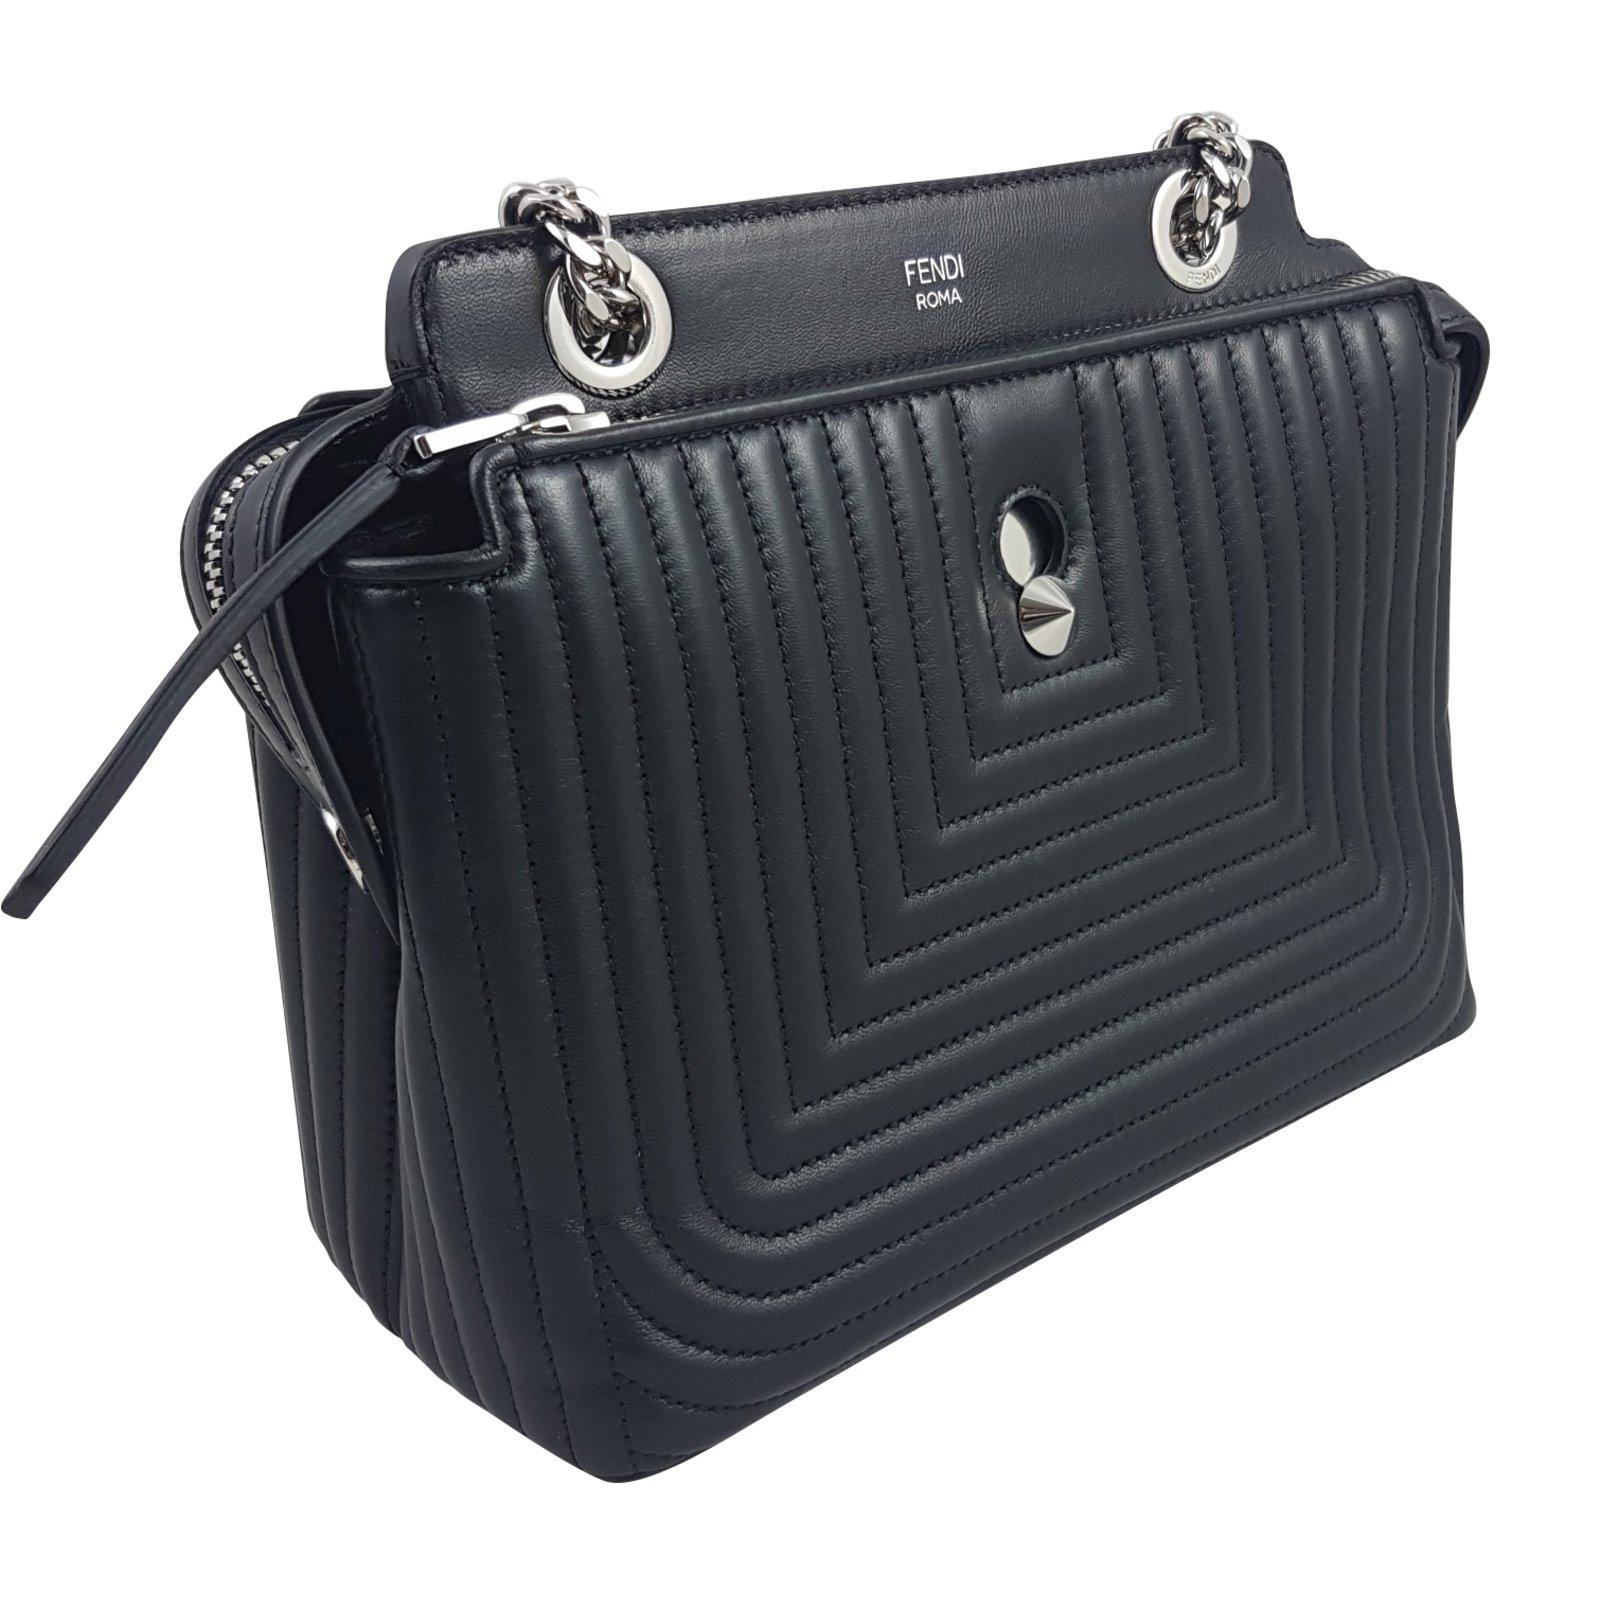 handbags bag bradley ella ebay itm vera leather quilted quilt tote